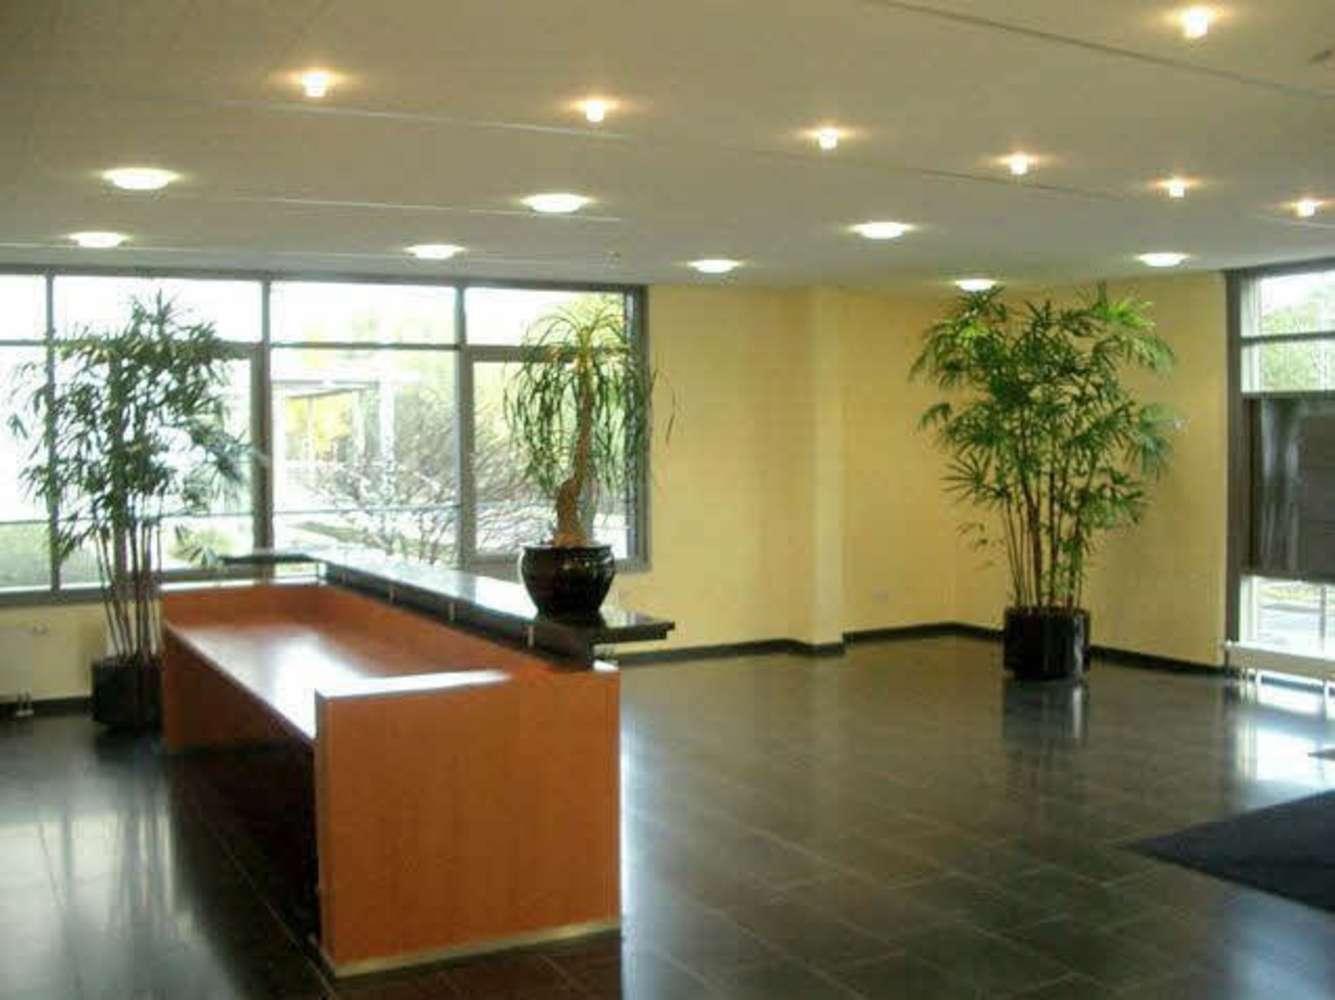 Büros Frankfurt am main, 60439 - Büro - Frankfurt am Main, Heddernheim - F1275 - 9390239